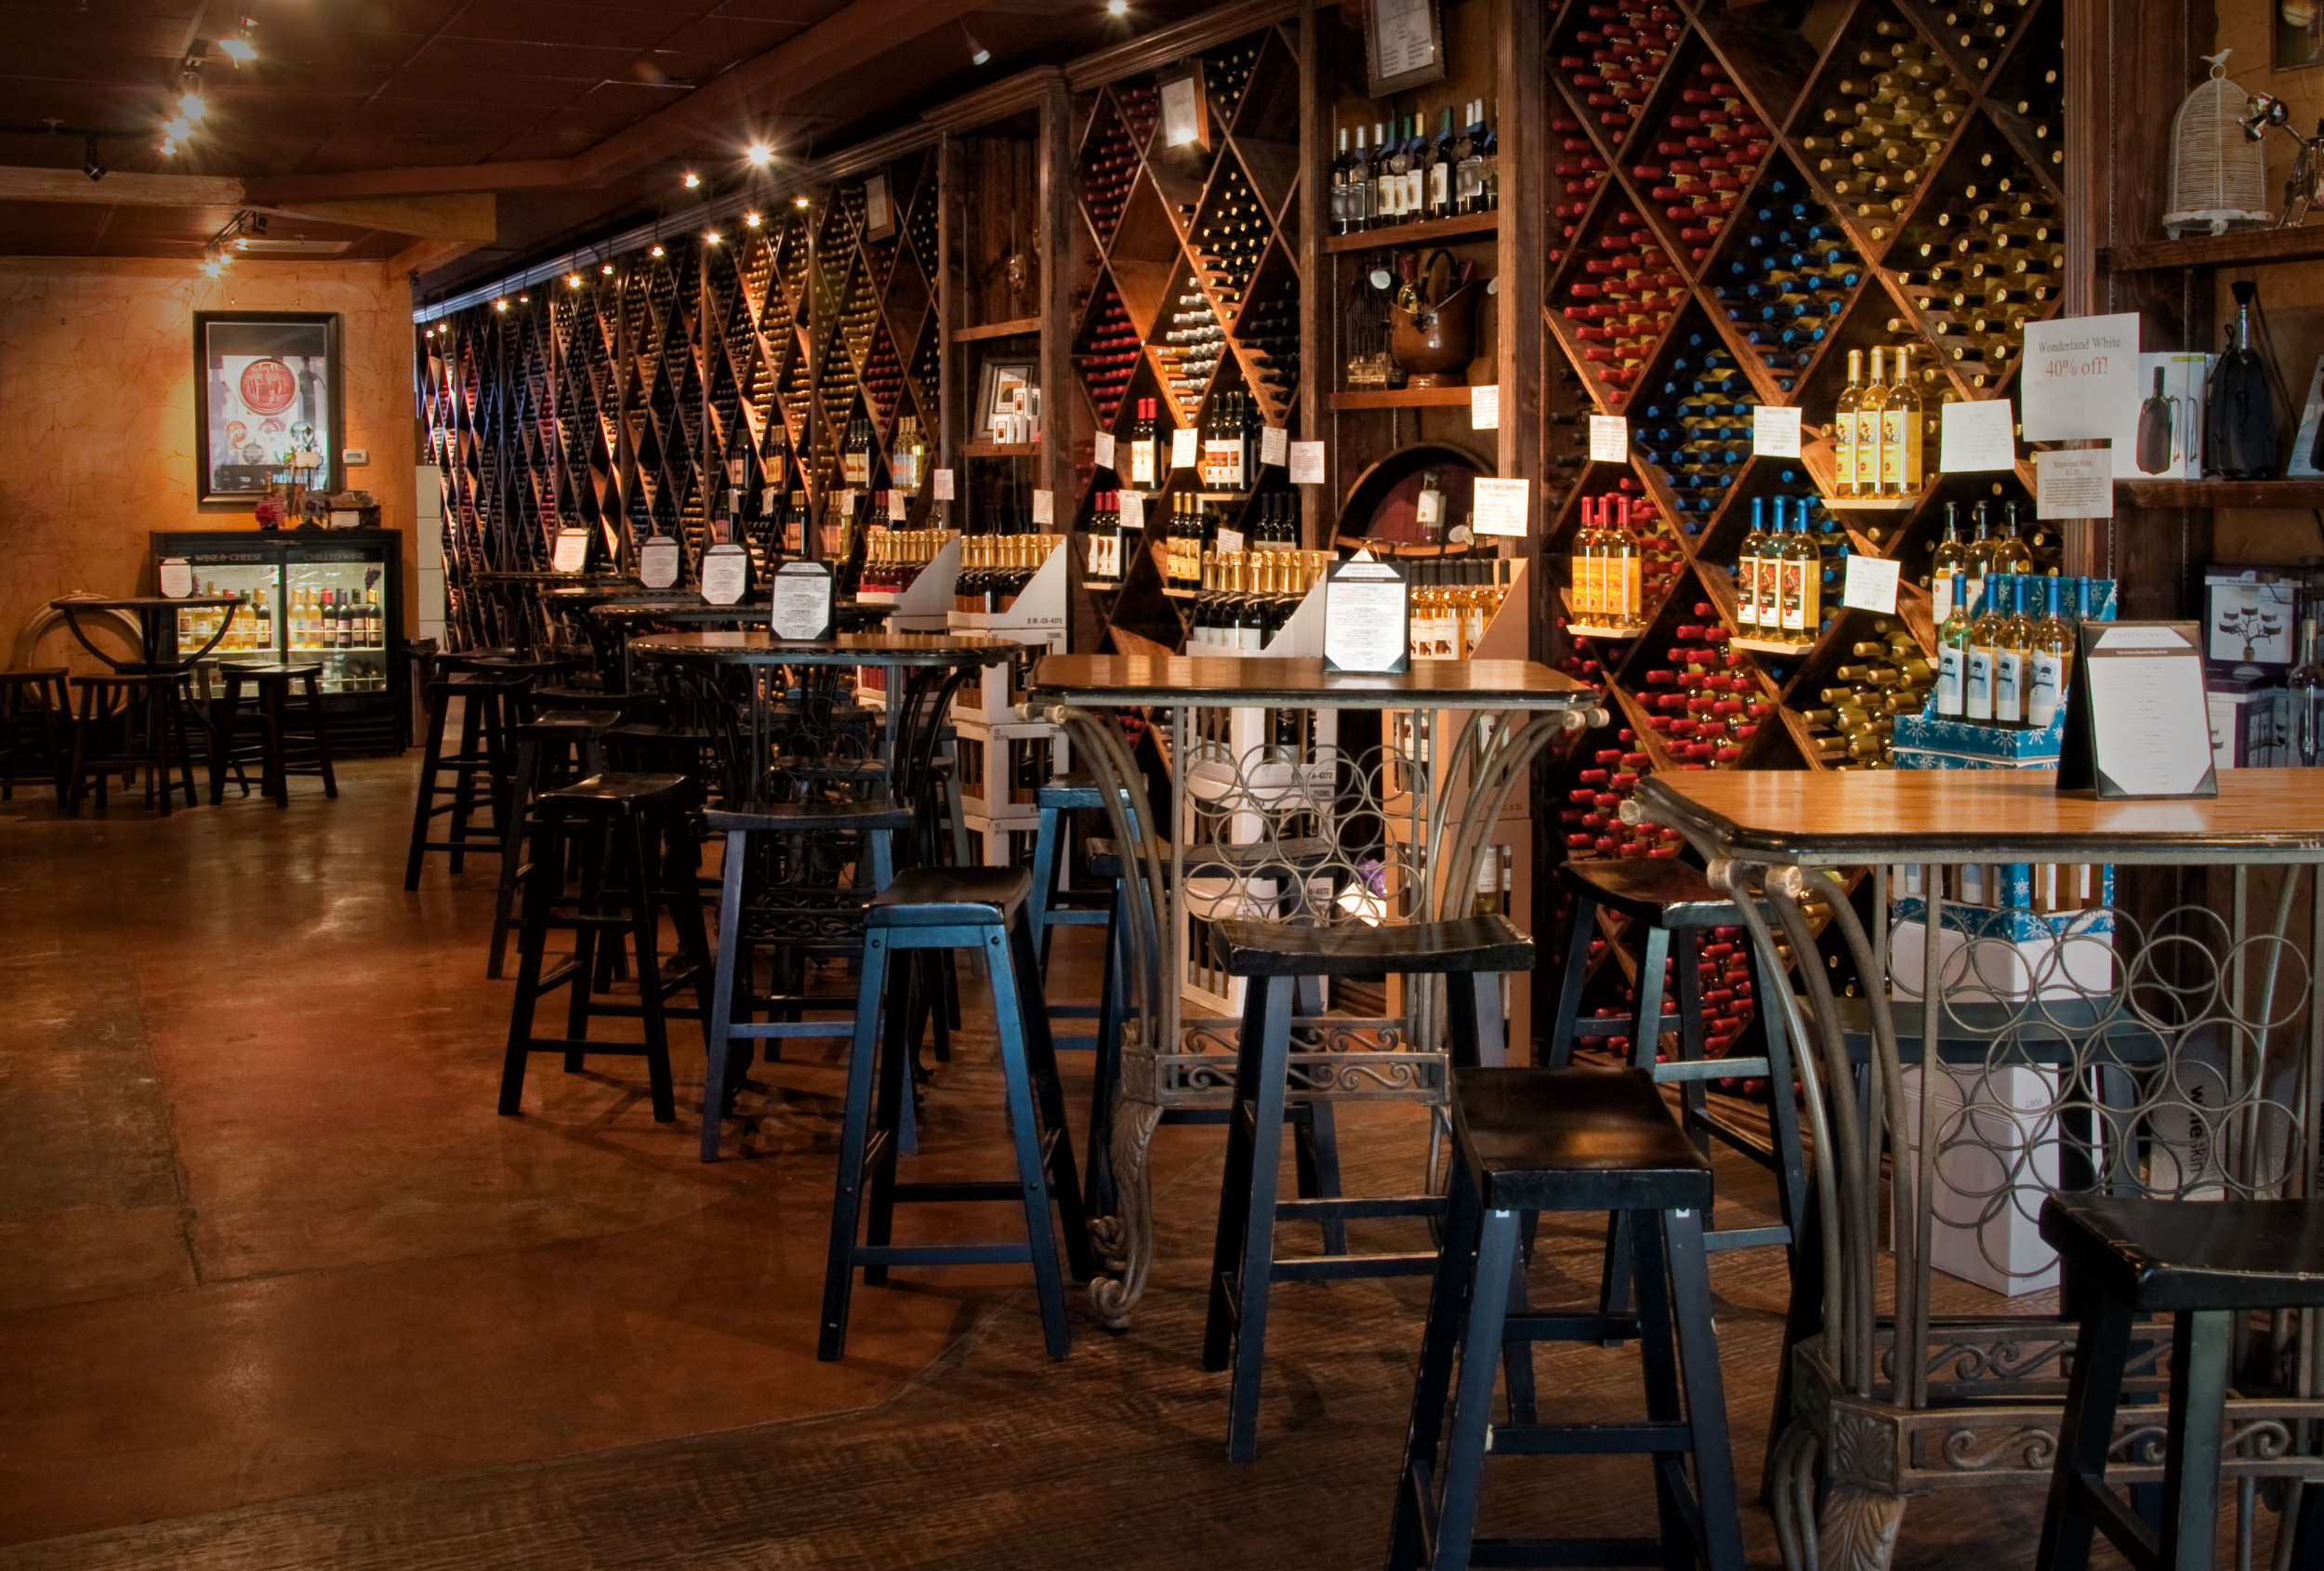 Winery_RC.jpg